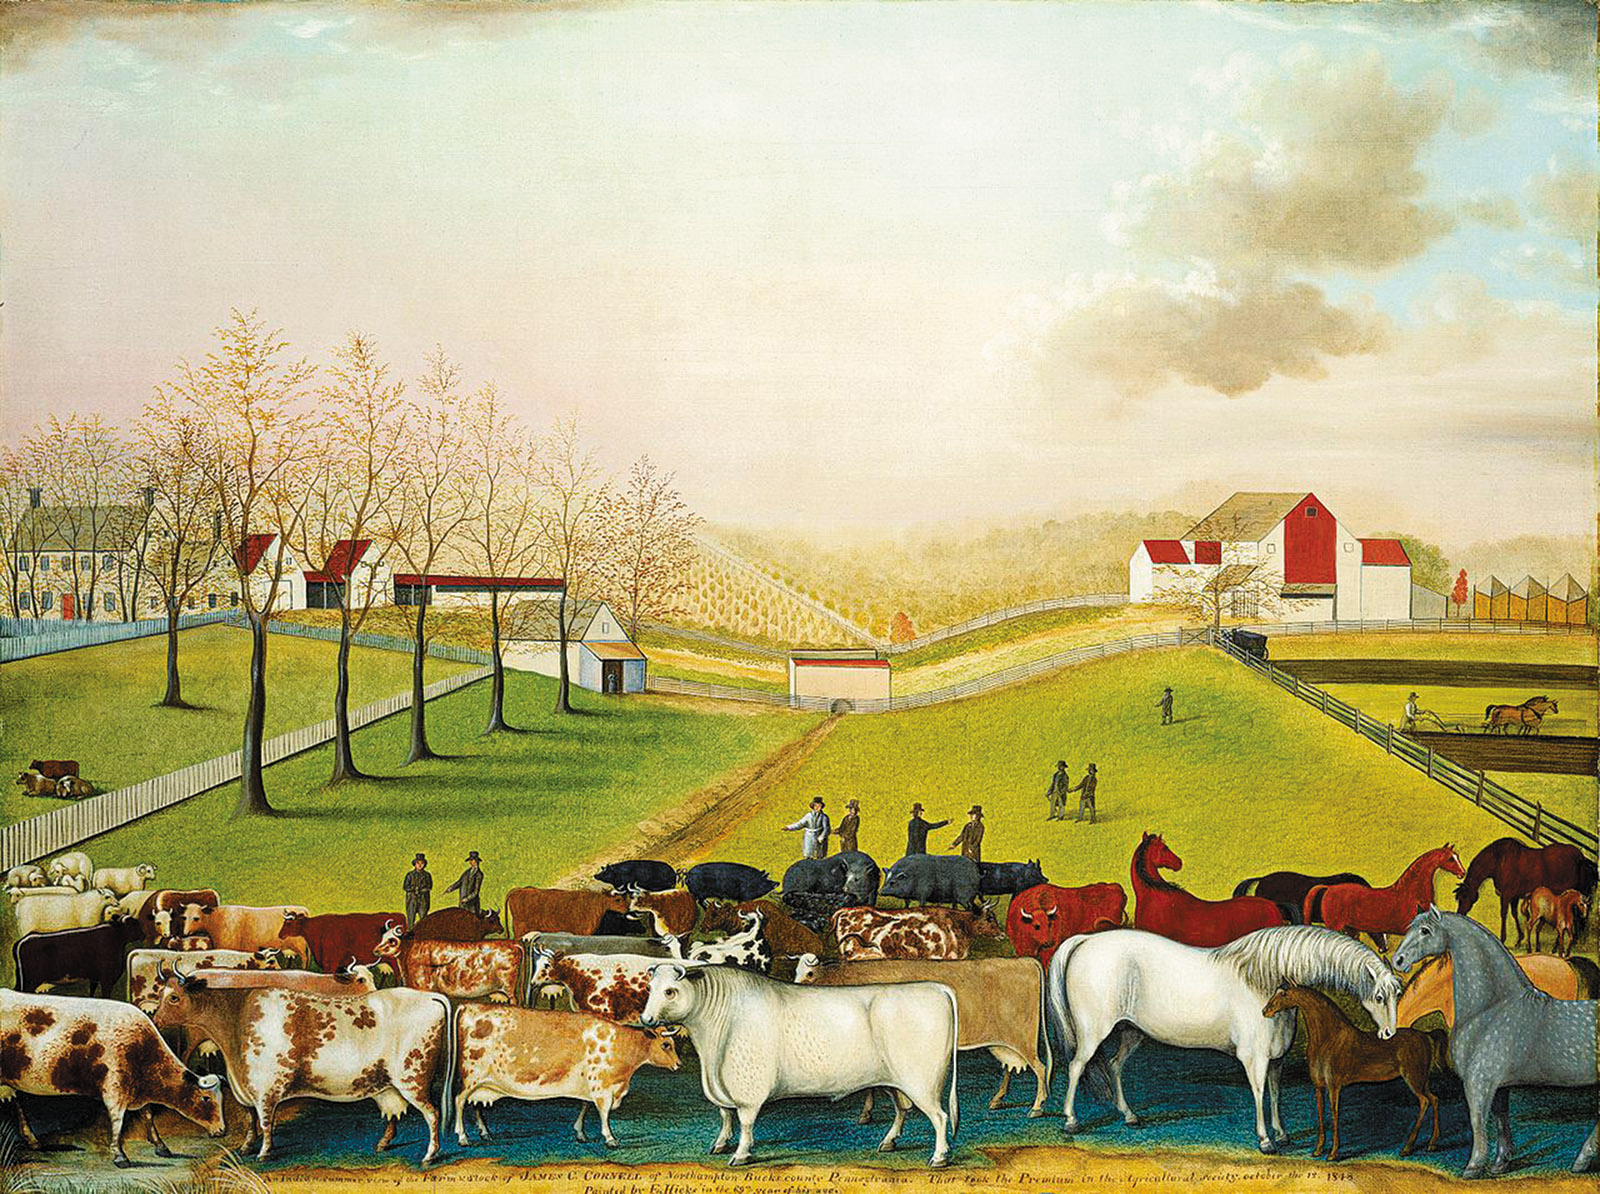 Edward Hicks: The Cornell Farm, 1848